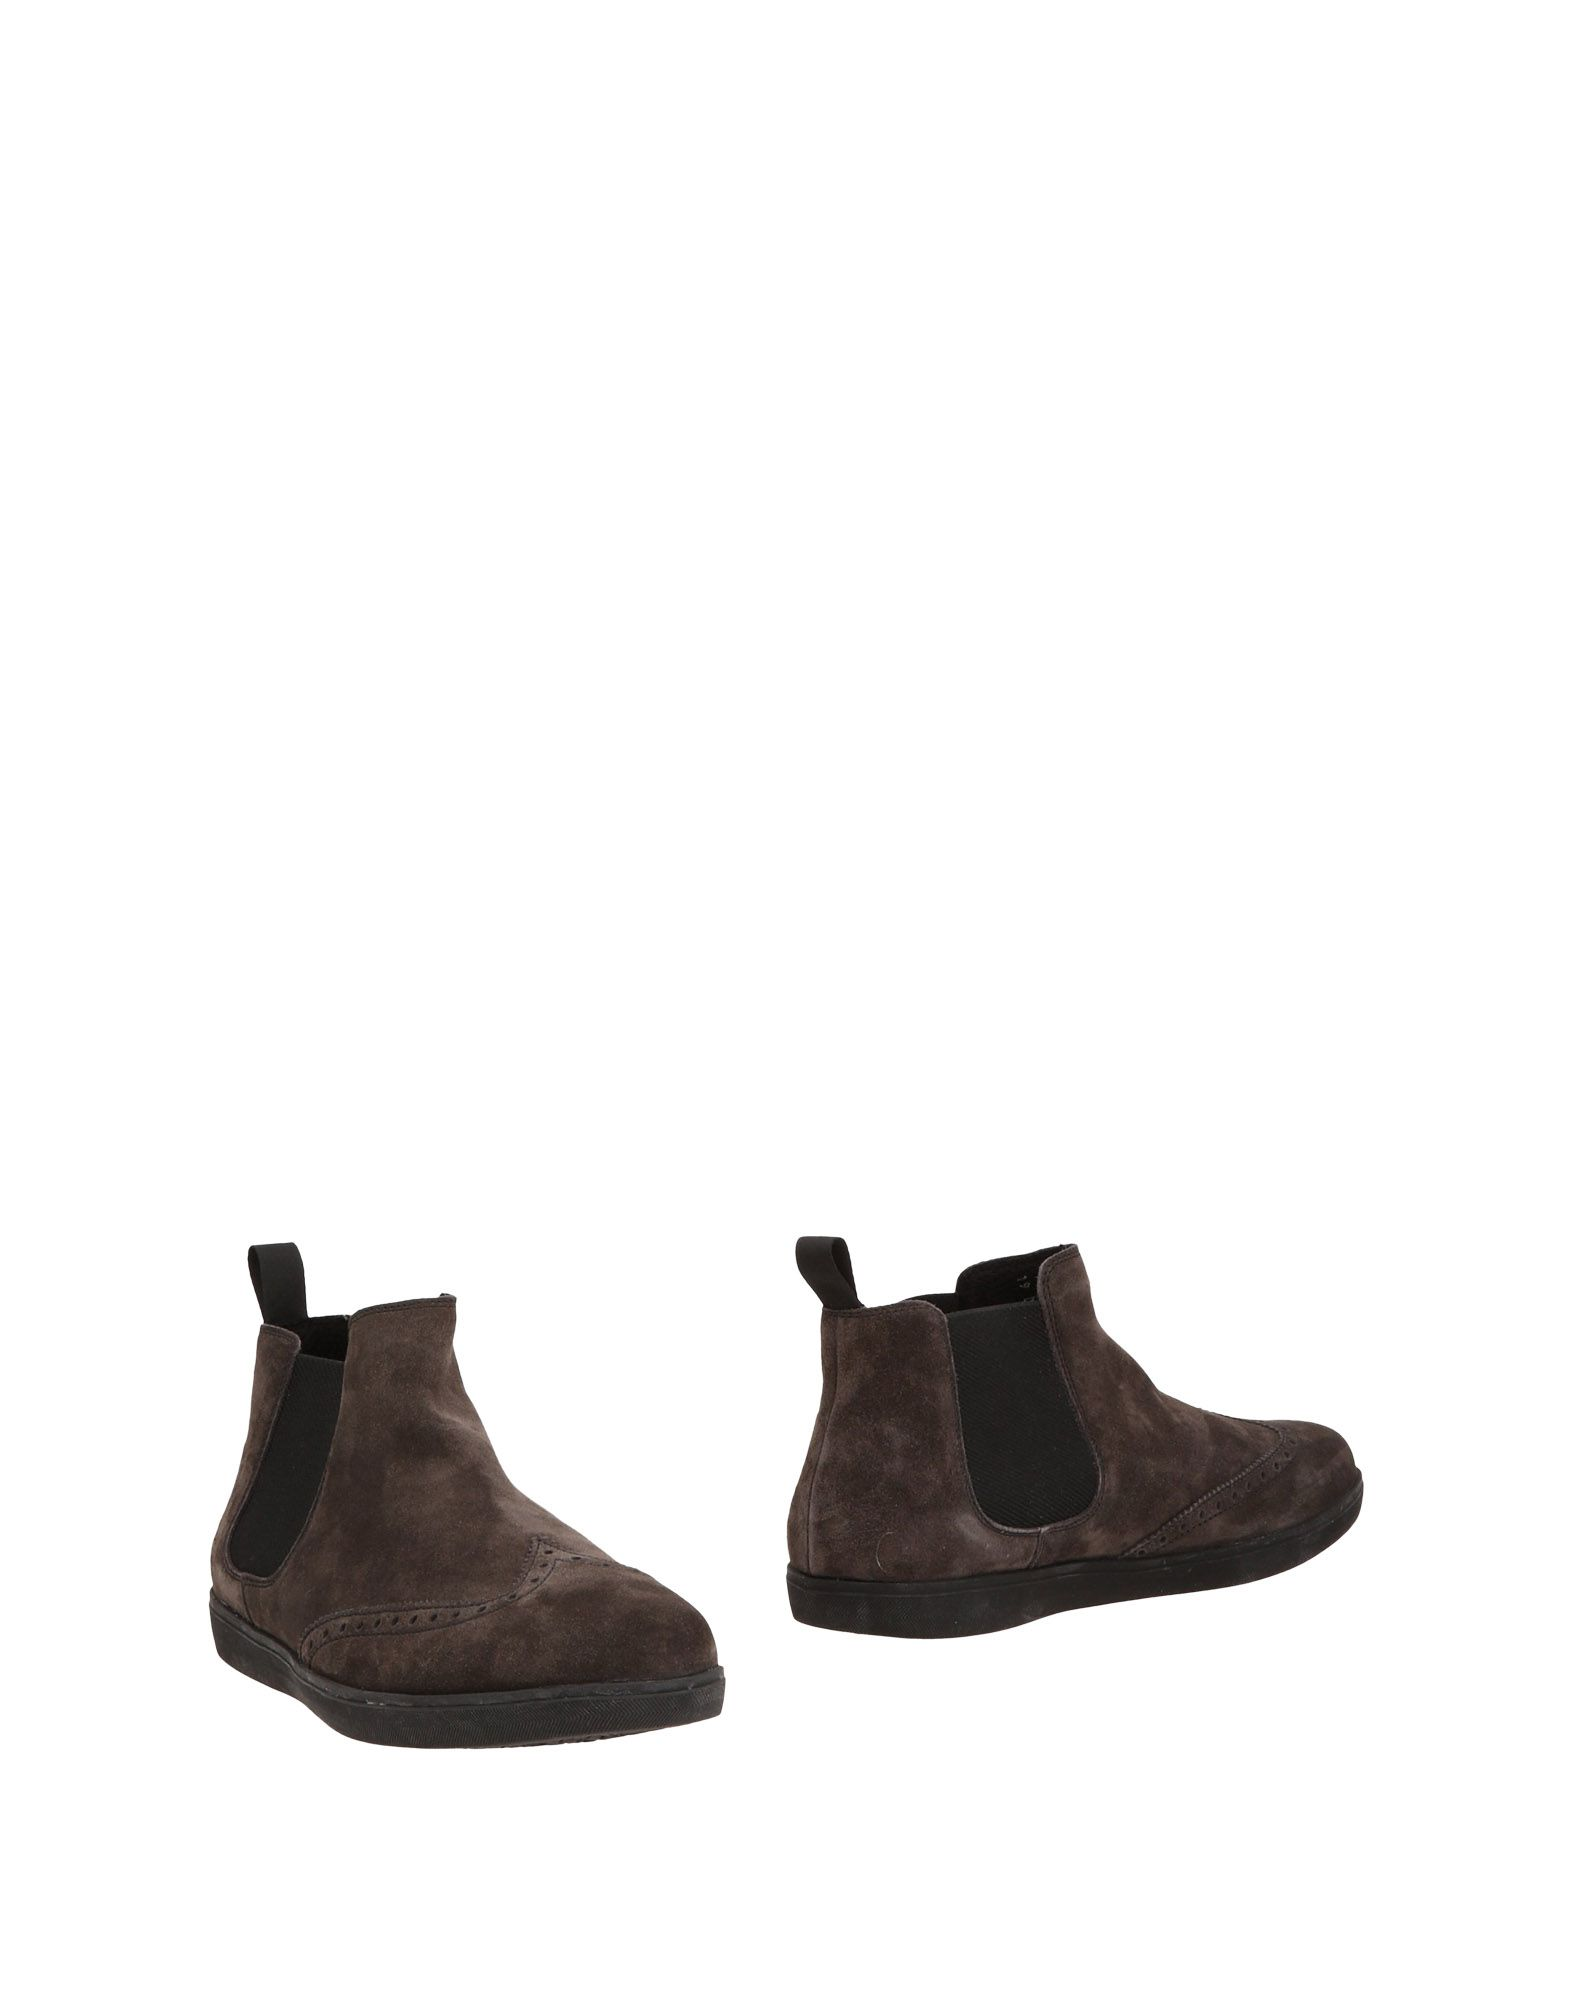 Rabatt echte  Schuhe Frau Stiefelette Herren  echte 11481574VD 1c2b6b